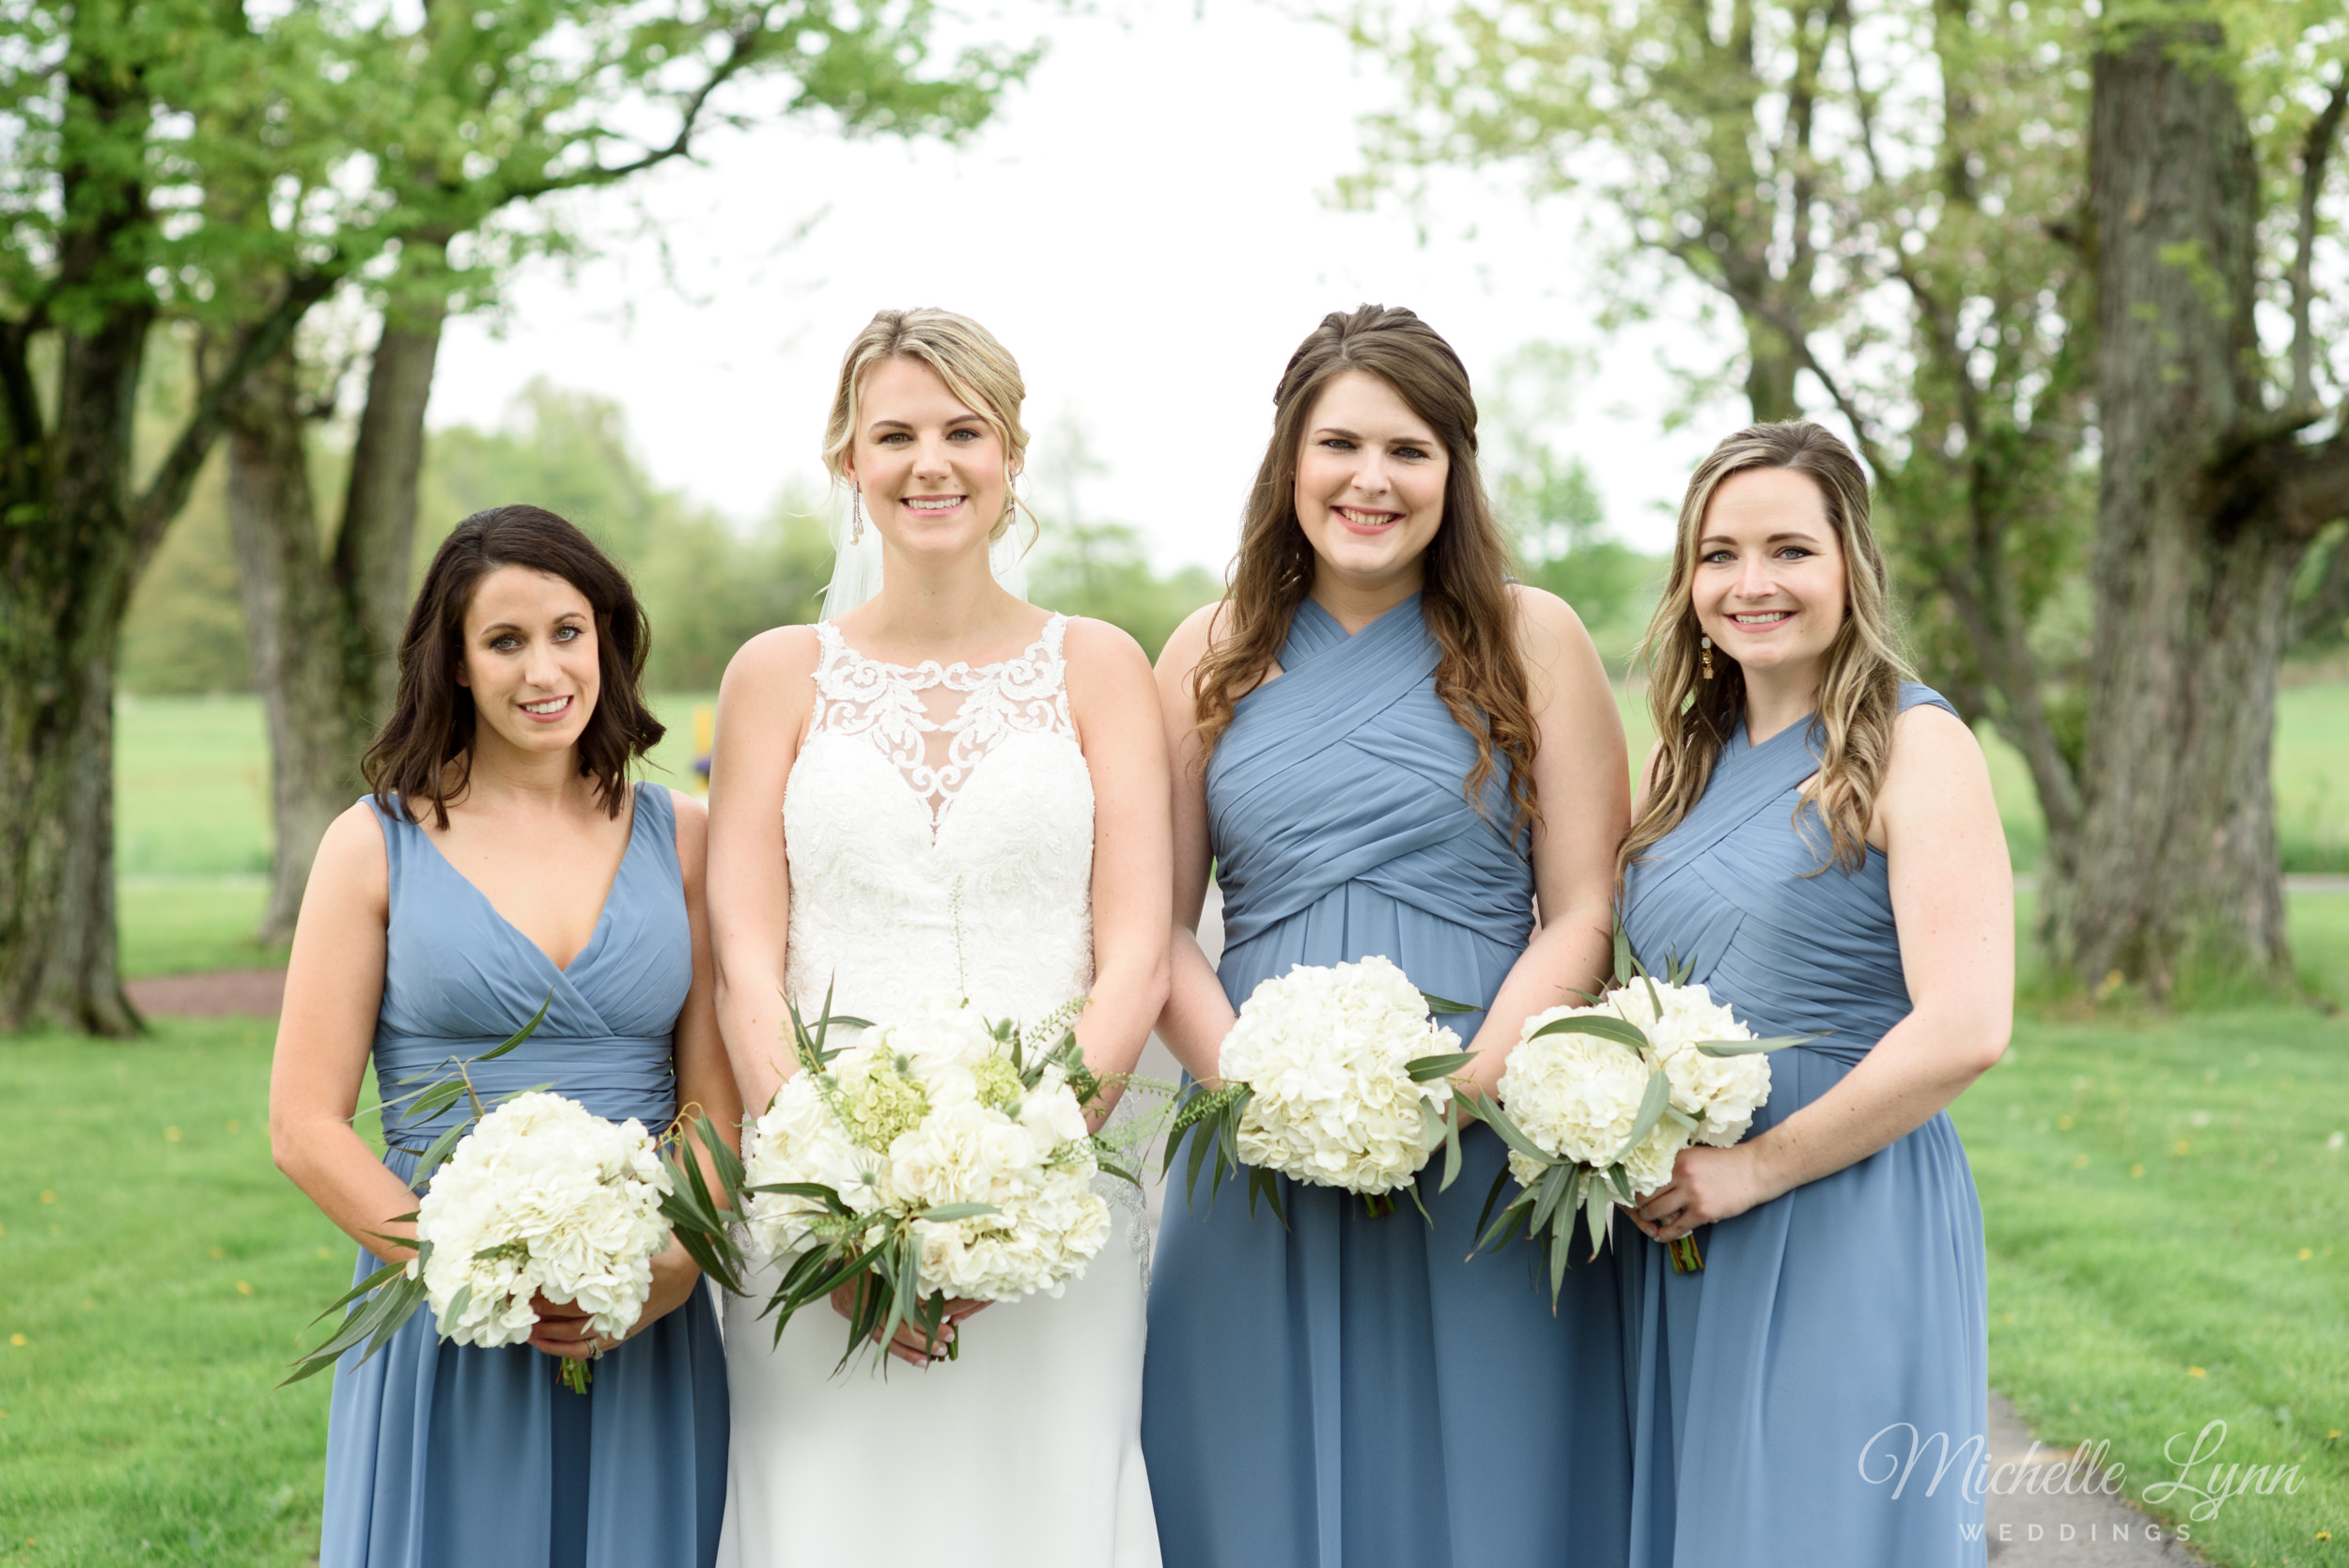 mlw-the-farm-bakery-and-events-wedding-photos-20.jpg